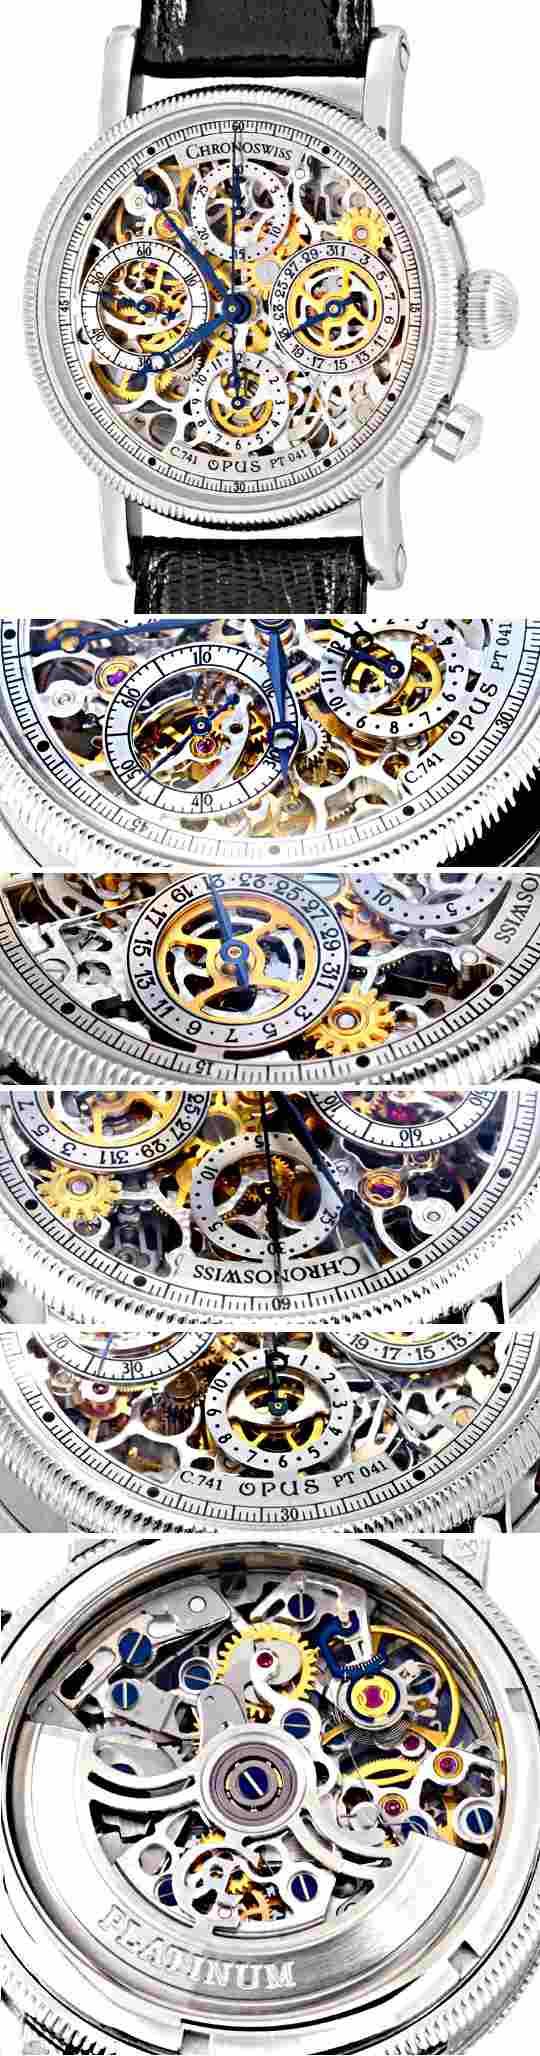 Foto 3, Chronoswiss Opus Platin Chronograph Skelletiert Geprüft, U1160